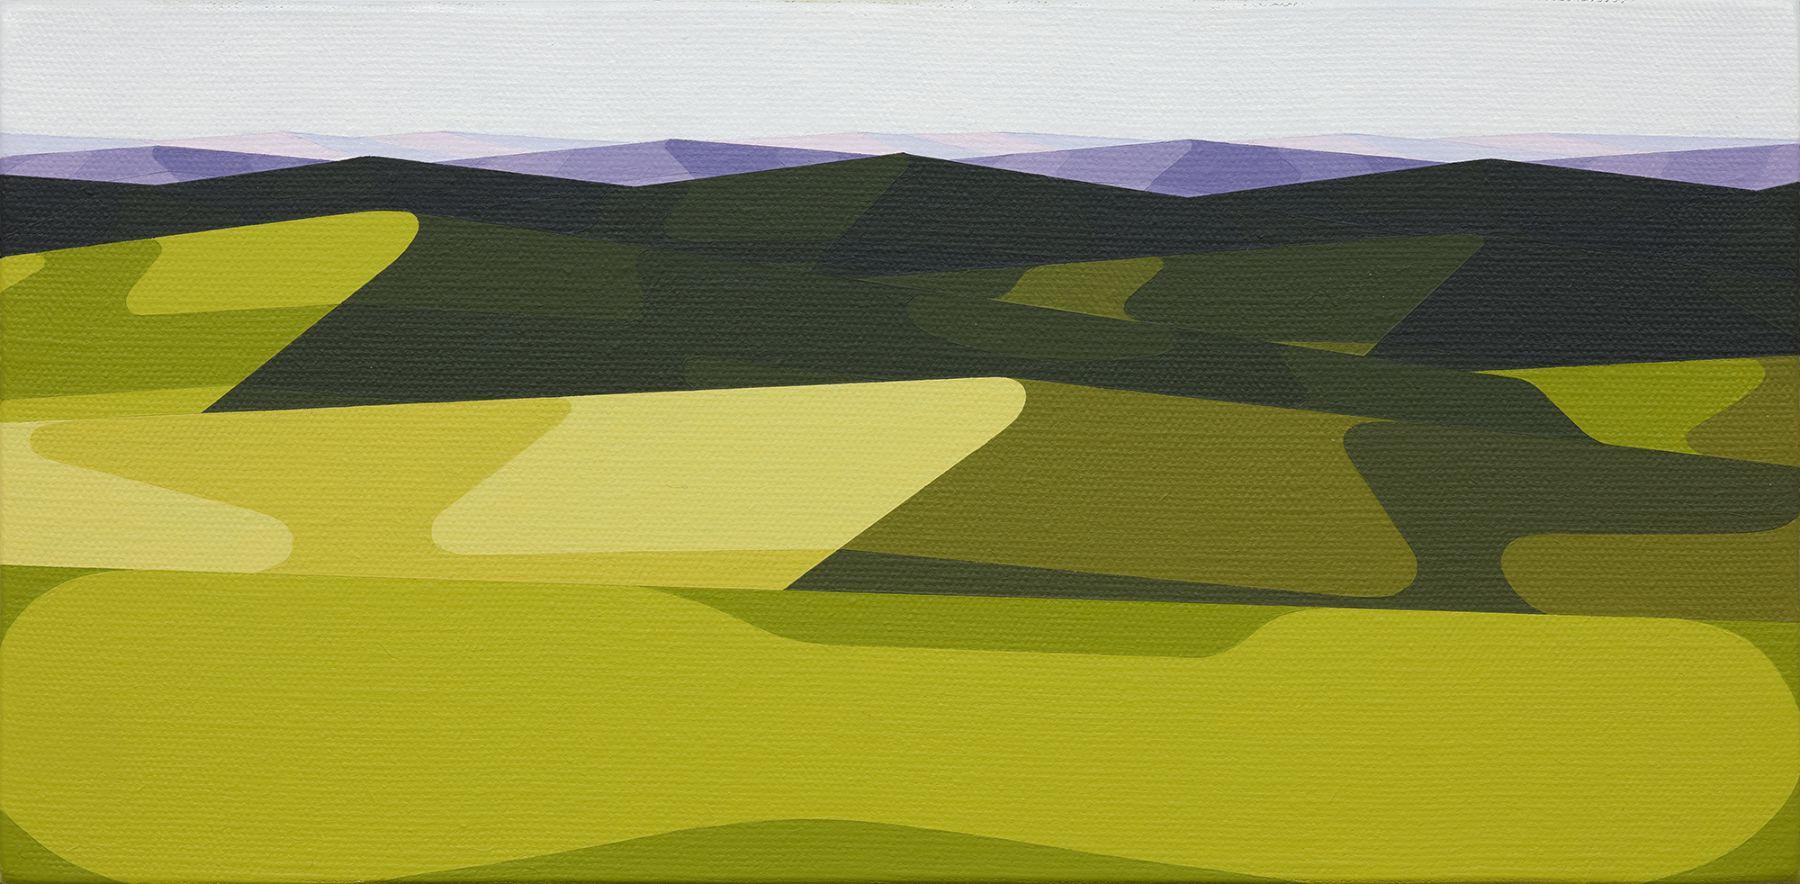 Albrecht Schnider  Landscape, 2019-2020  Oil on canvas  16.5 x 33 cm  Image © Julien GremaudDominique Uldry, Bern